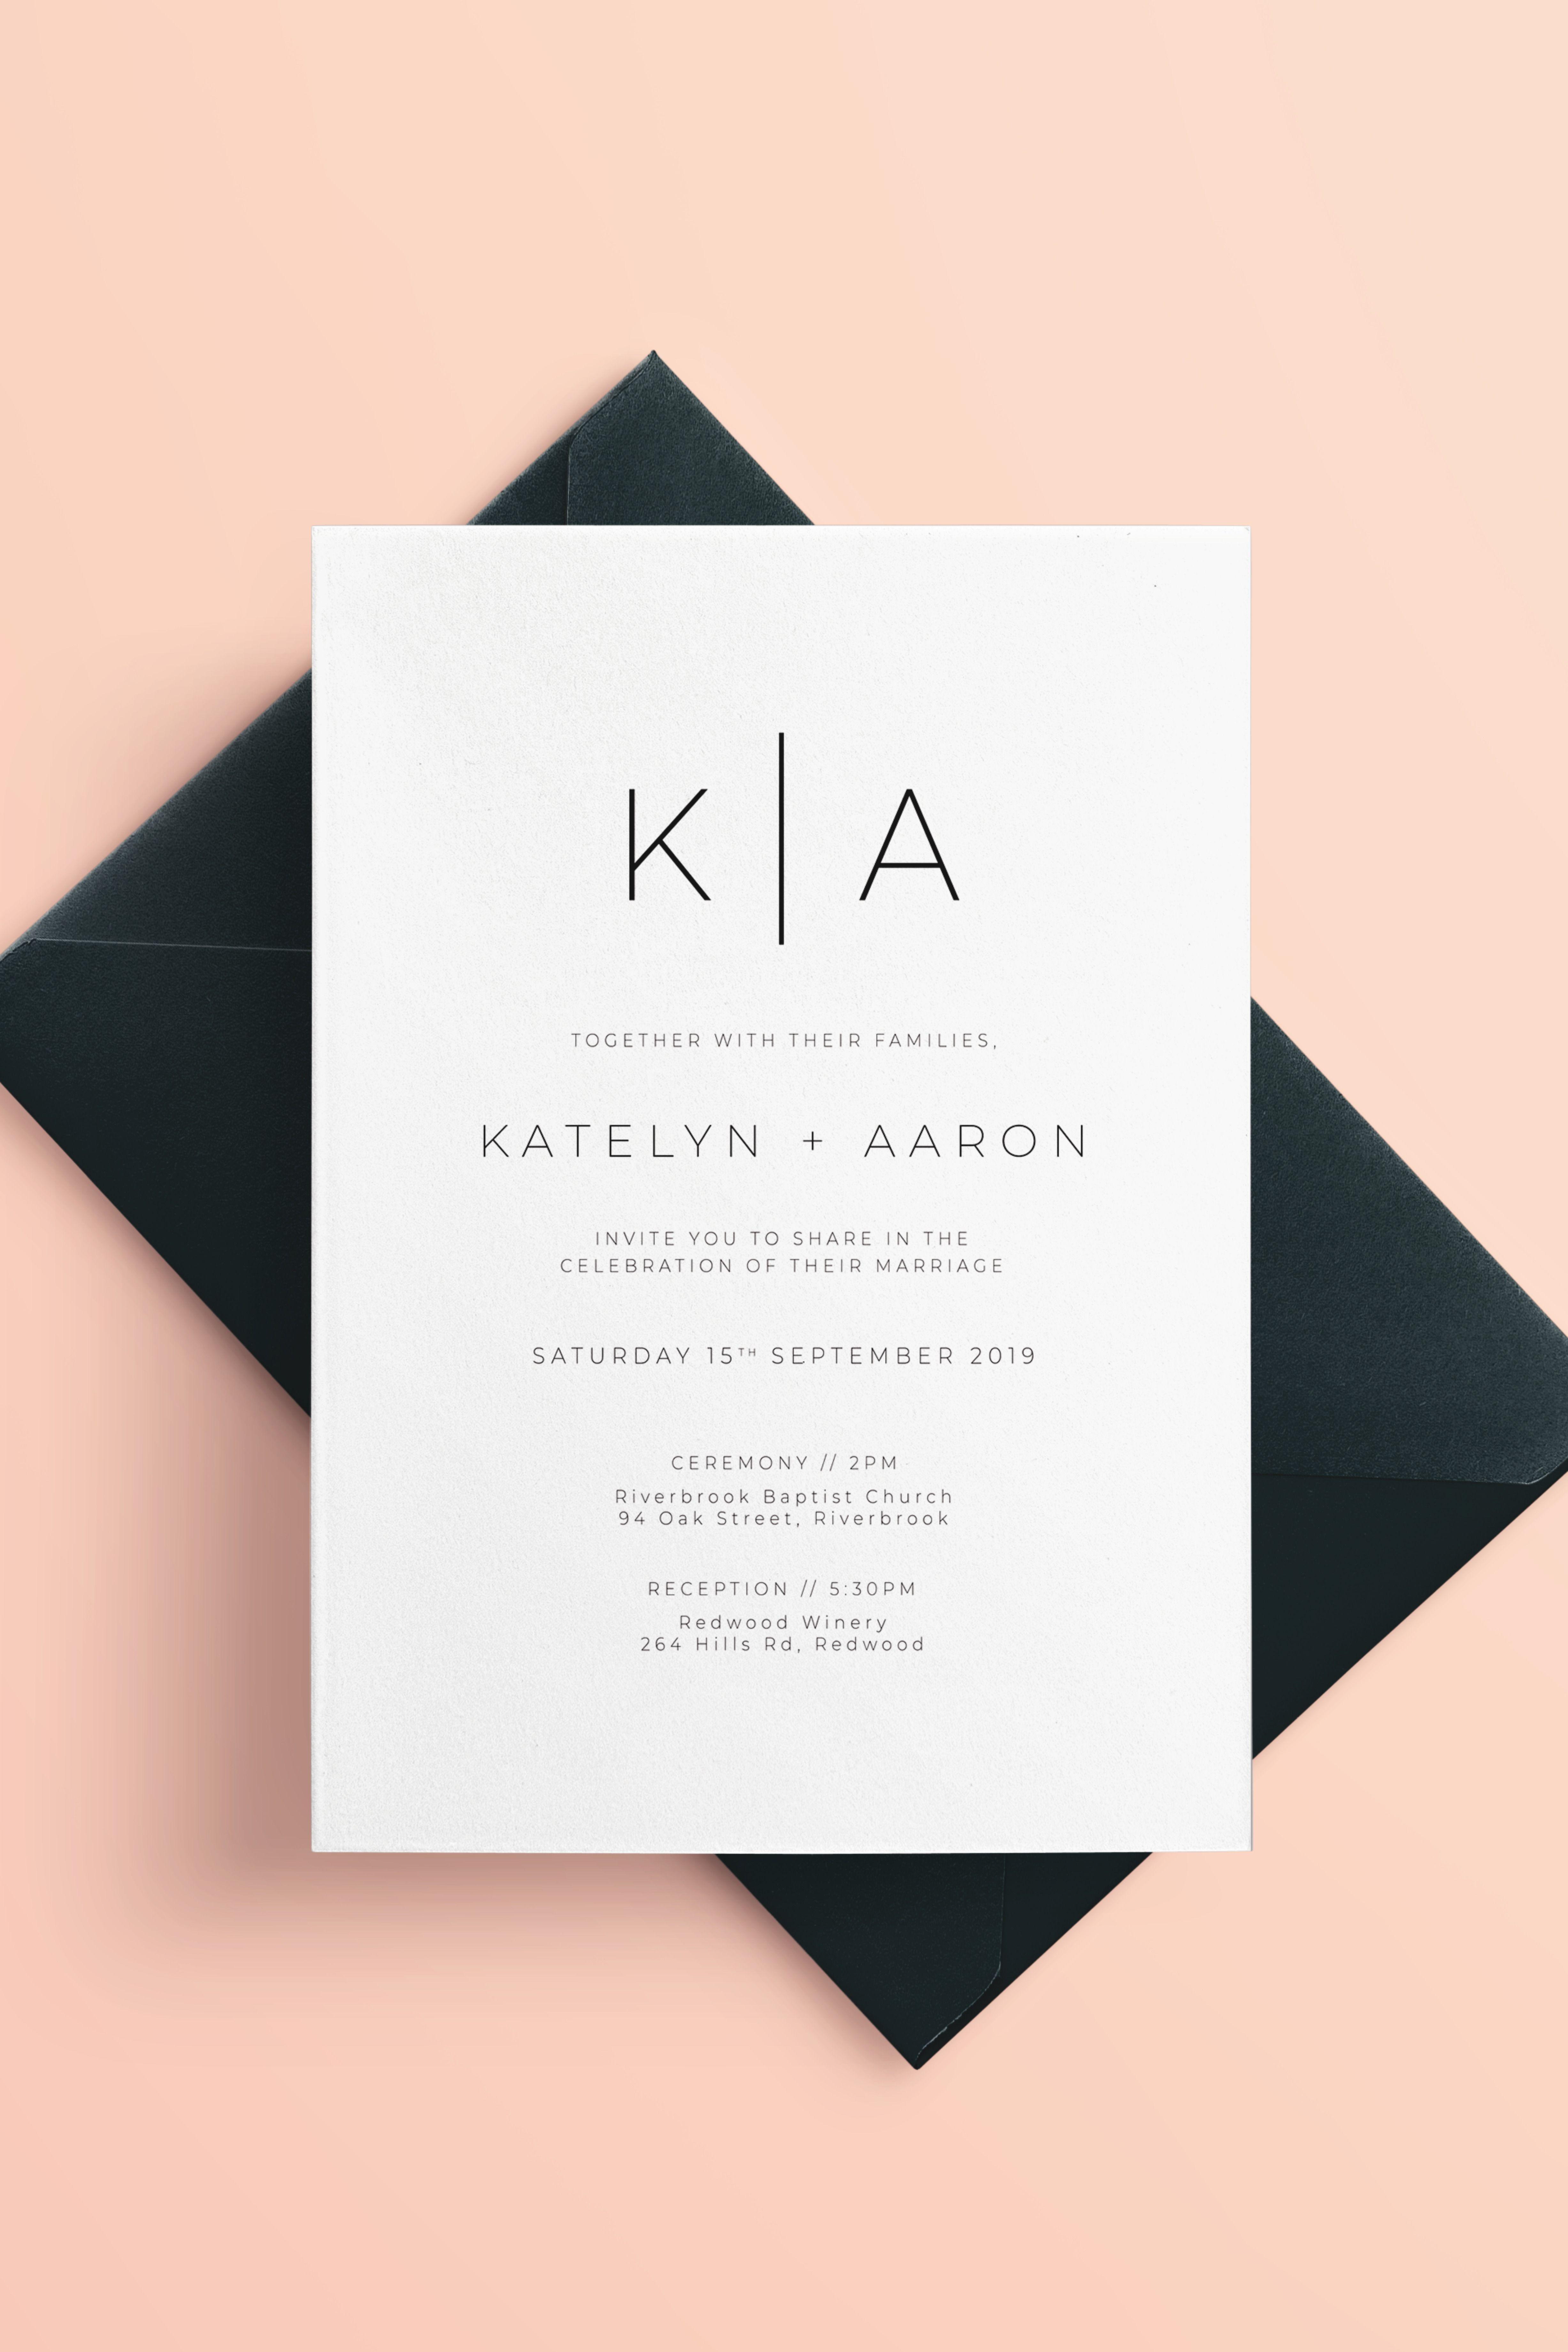 Modern Minimalist Wedding Invitations | Minimalist wedding invitations,  Minimalist wedding invitation modern, Etsy wedding invitations